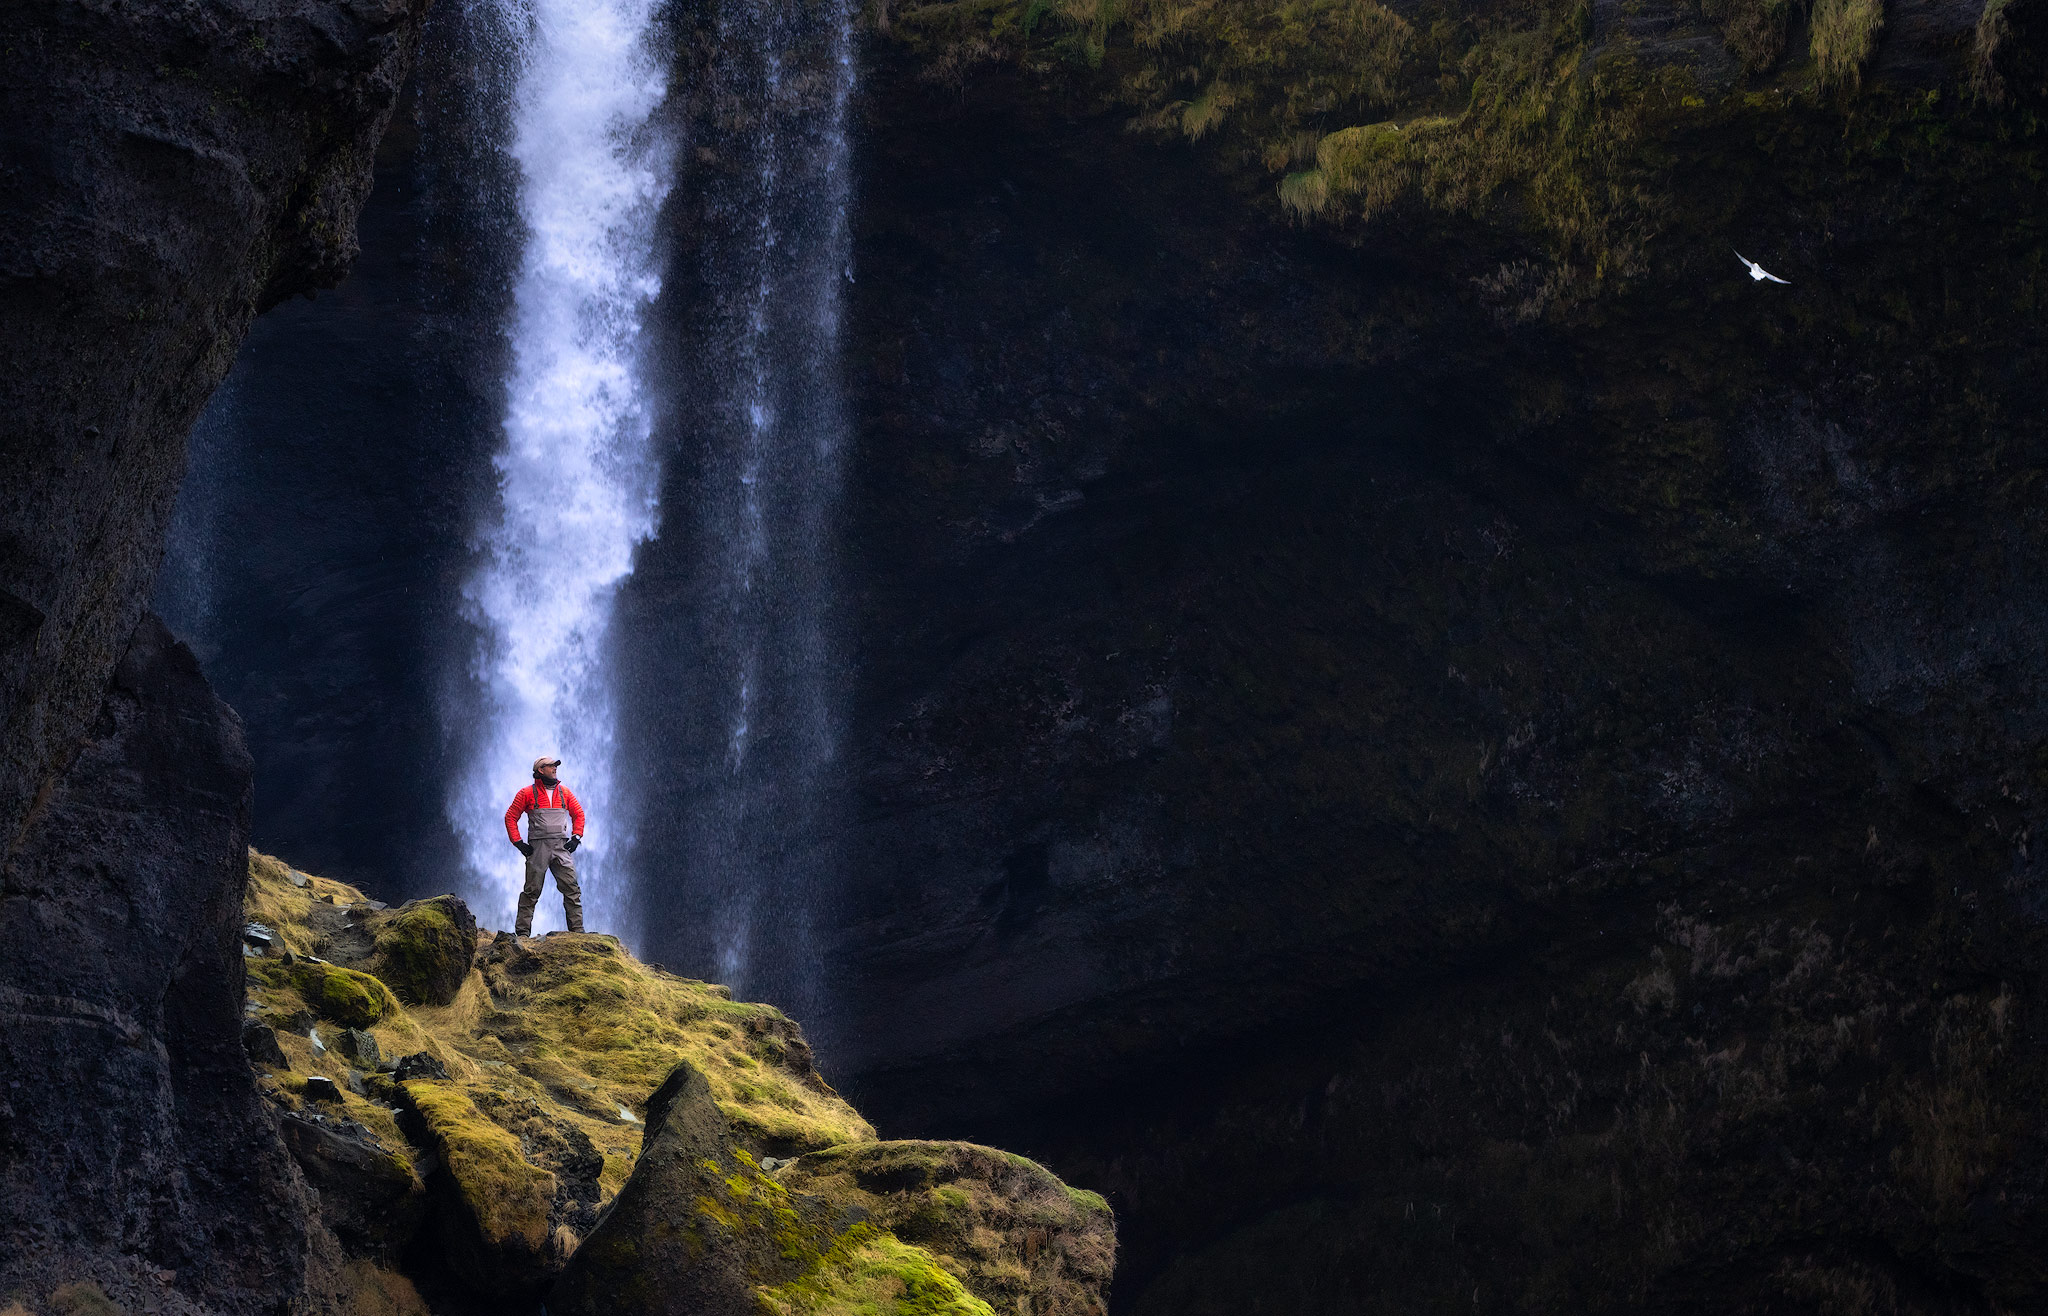 craig-under-the-falls.jpg